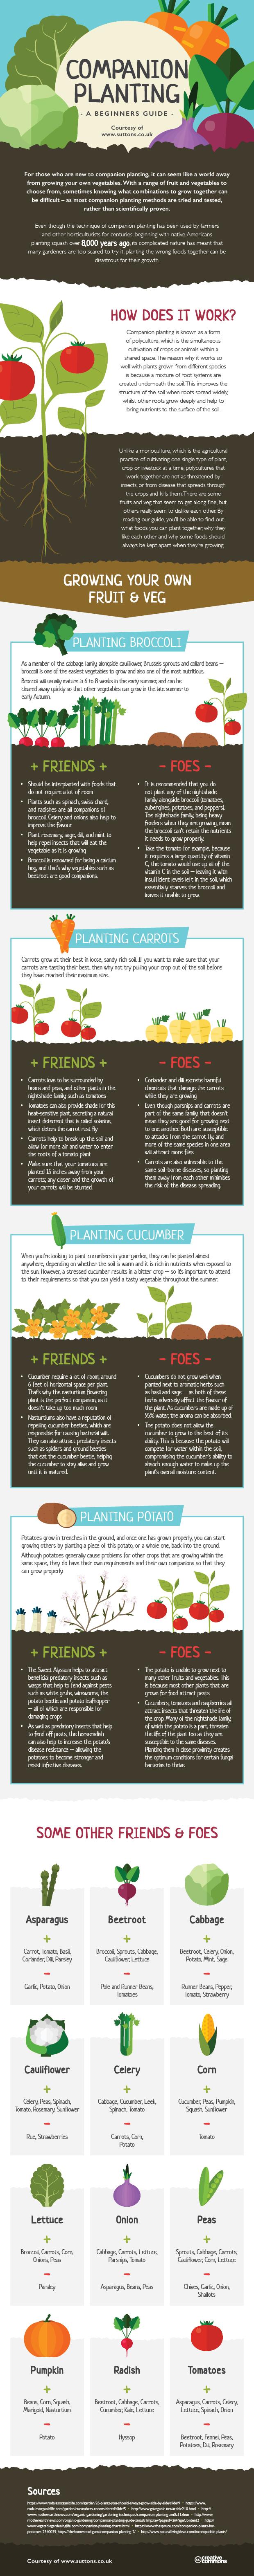 Companion Planting Infographic v4-2